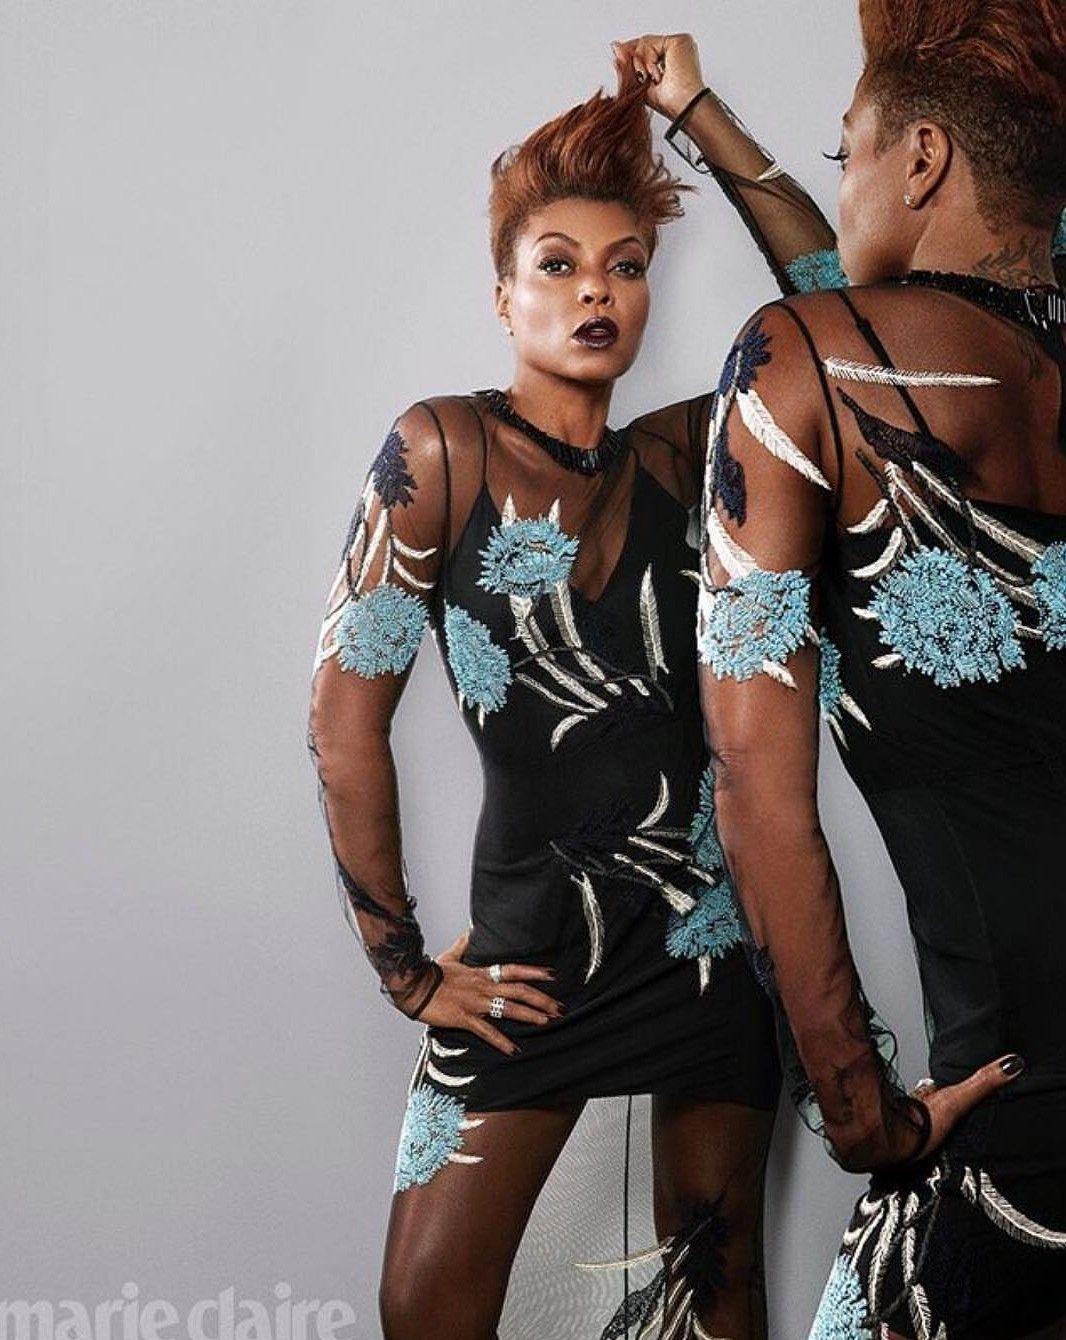 Taraji P. Henson proudly displays her lingerie in a sheer